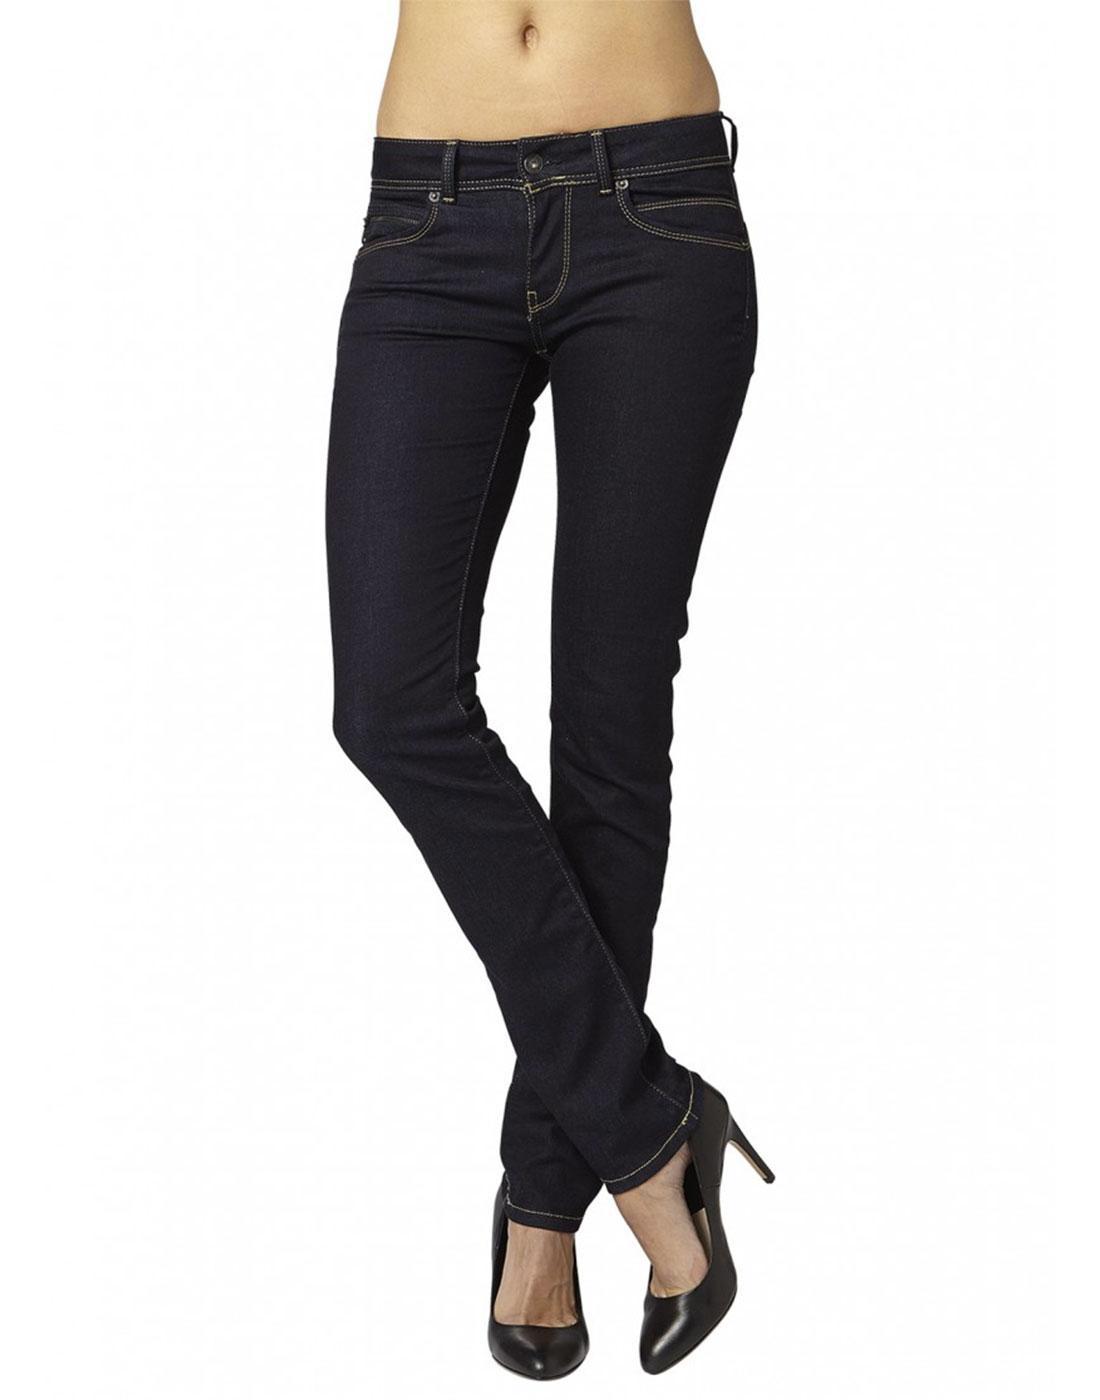 pepe jeans new brooke retro 60s dark denim skinny jeans. Black Bedroom Furniture Sets. Home Design Ideas